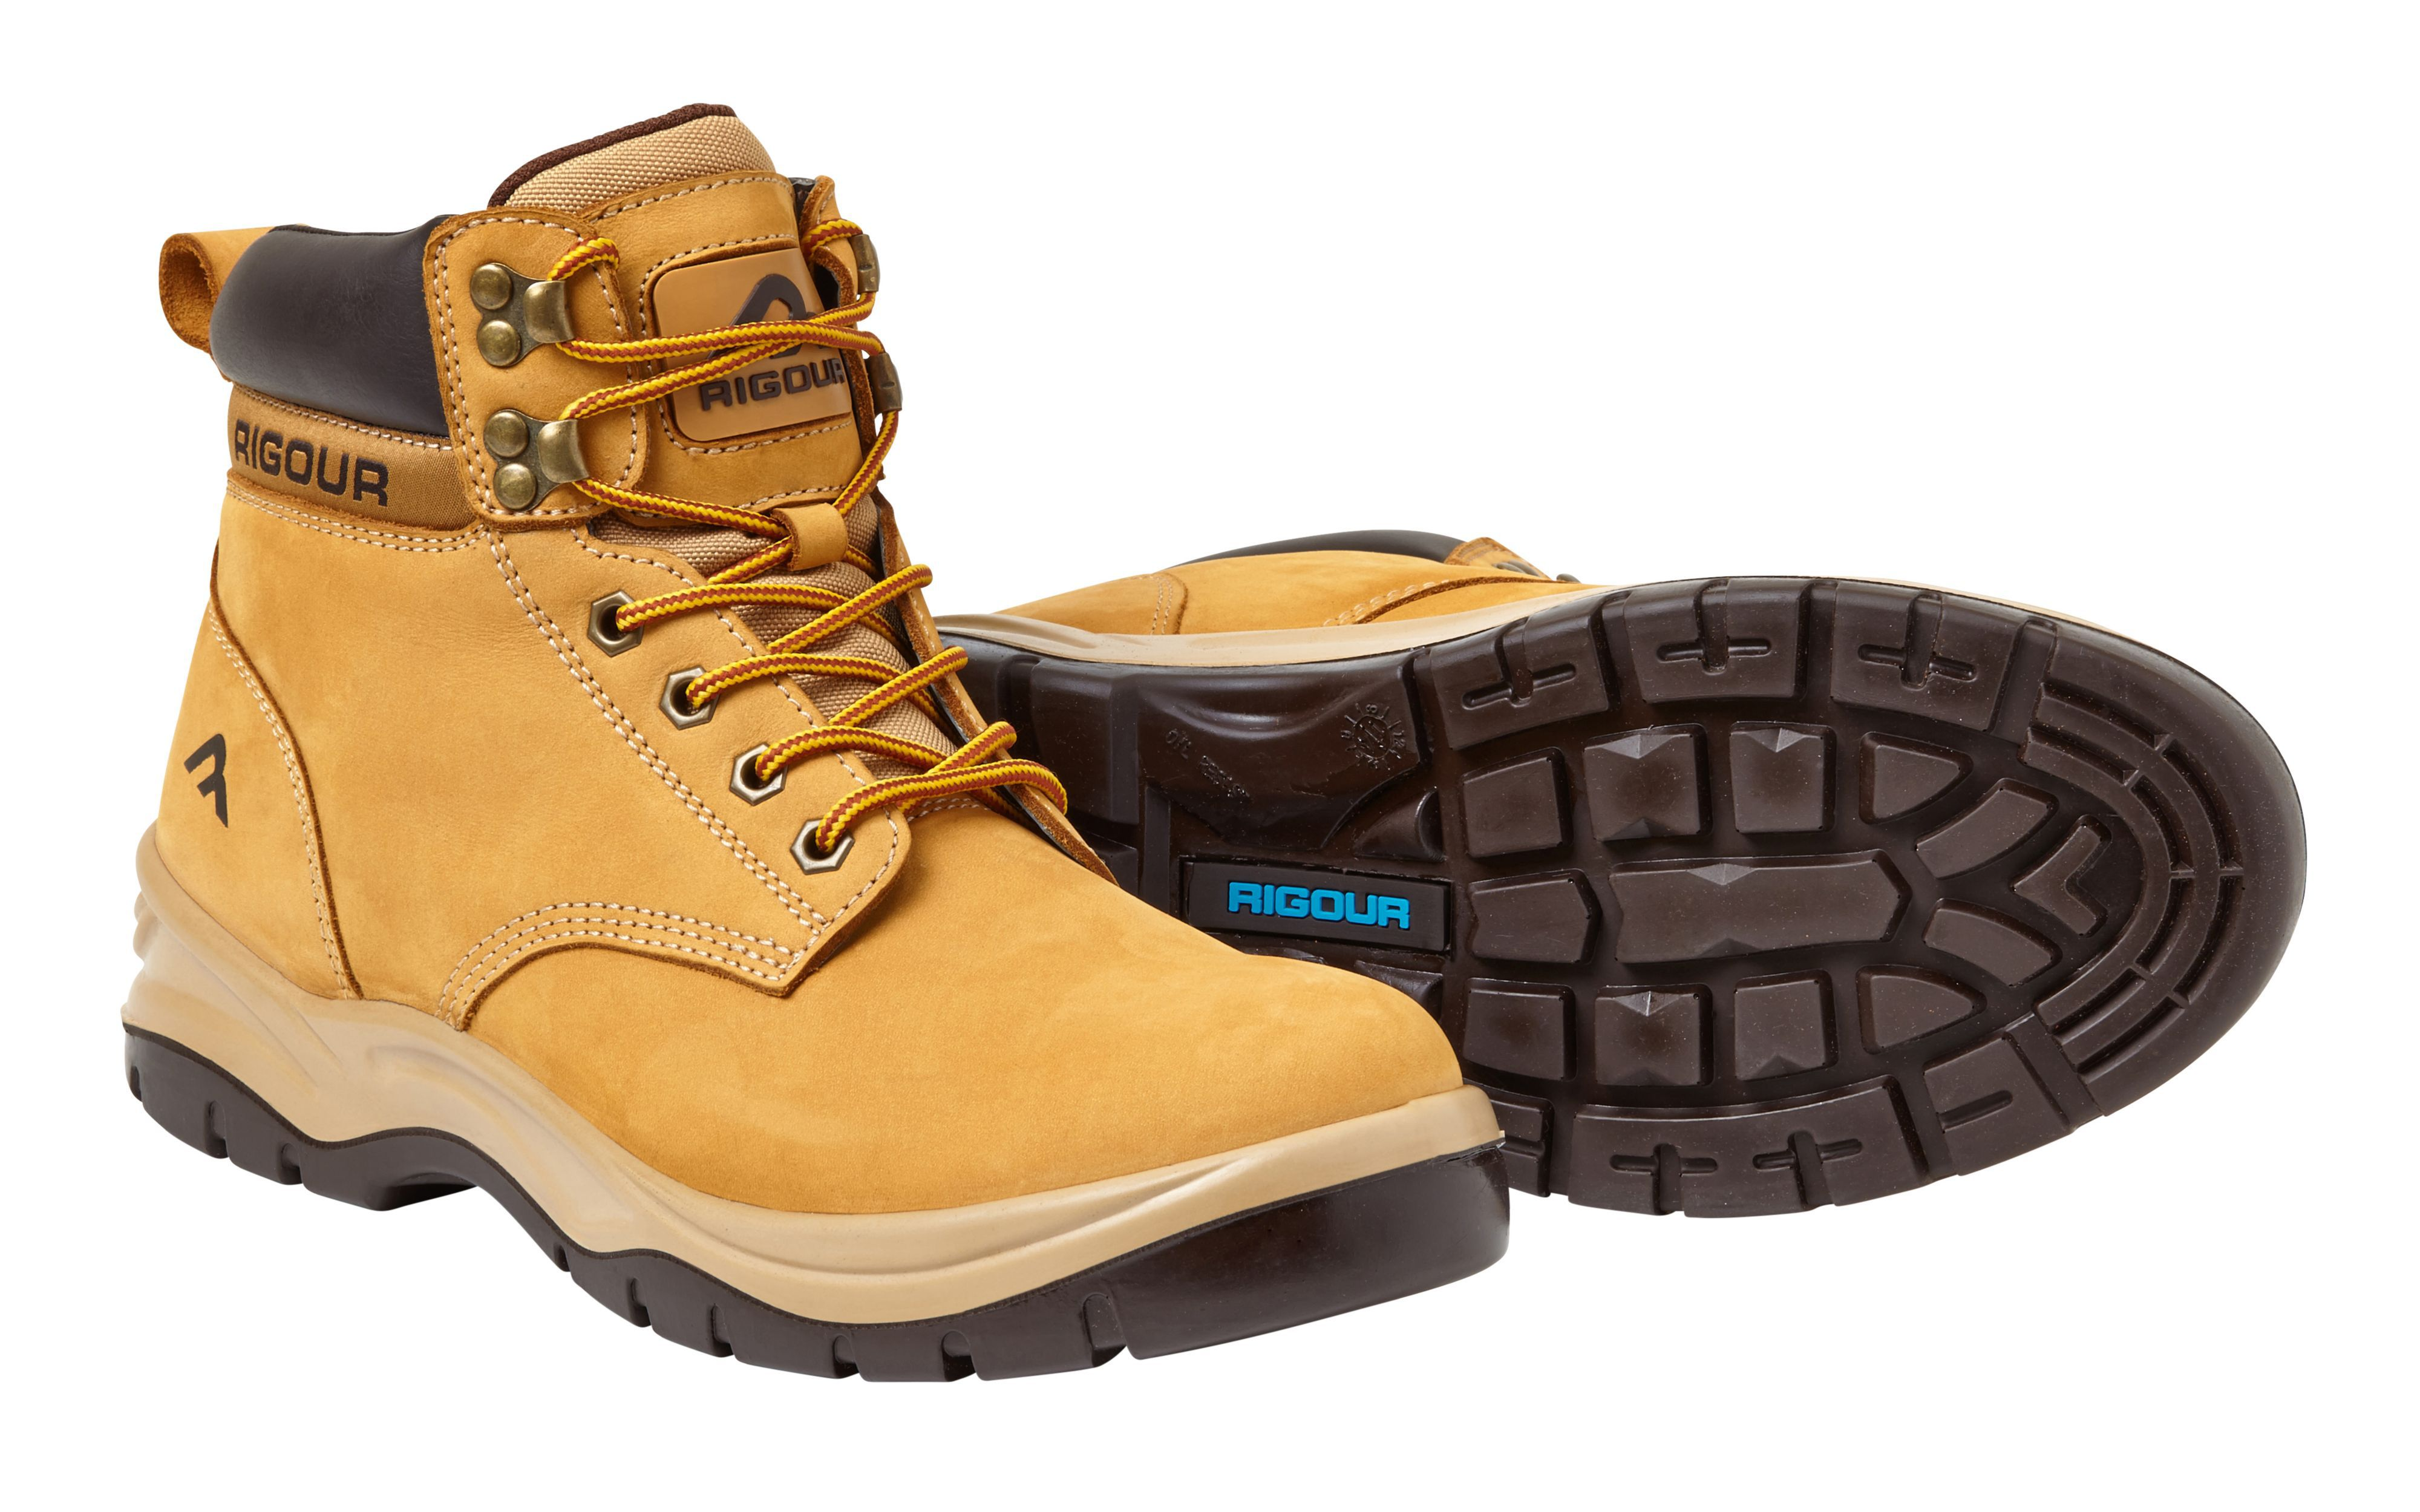 Rigour Wheat Safety Work Boots, Size 7